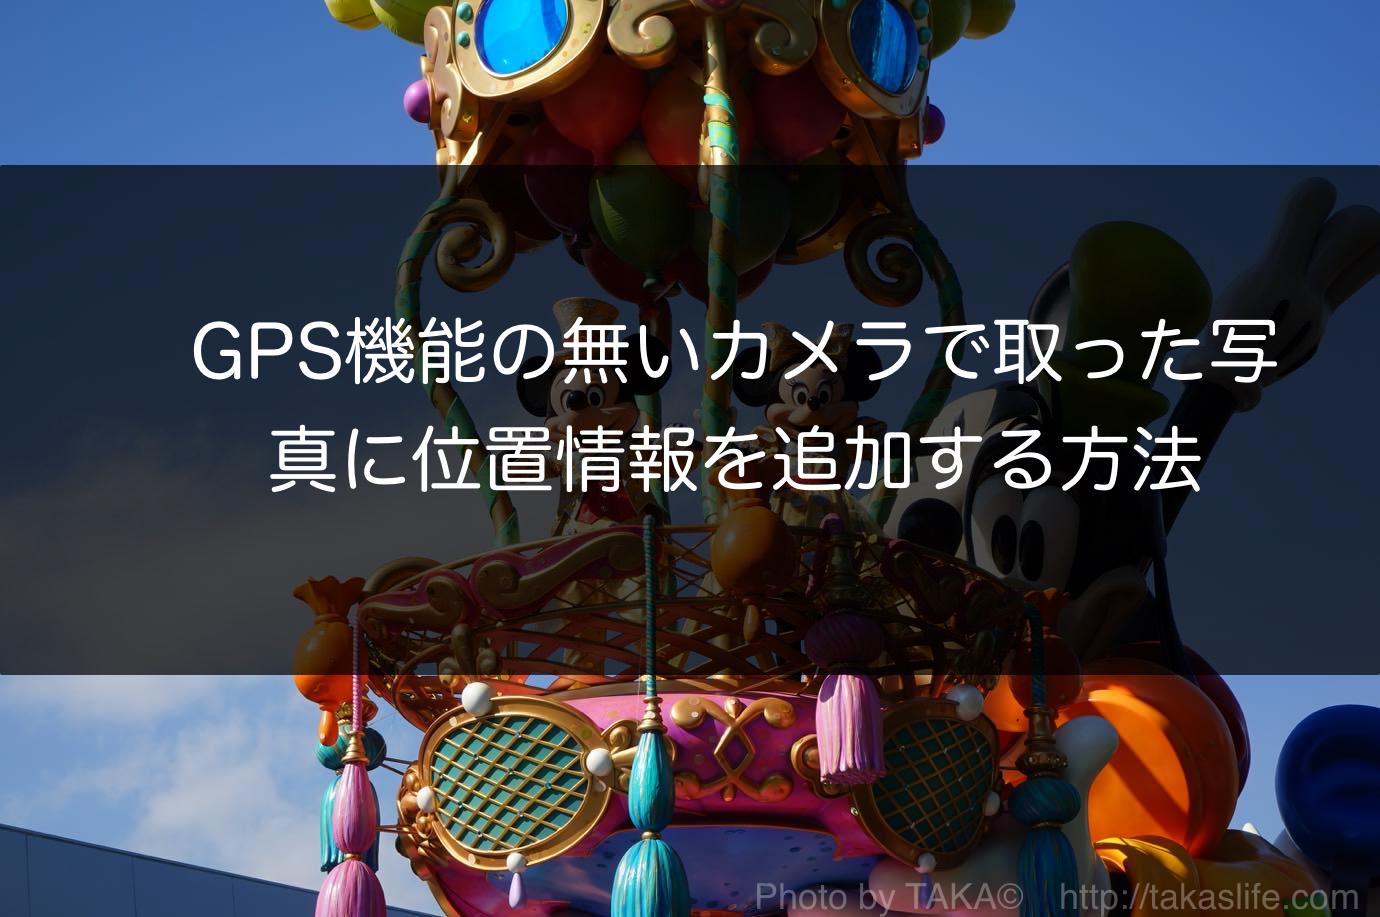 GPS情報追加 01 20160310 232959